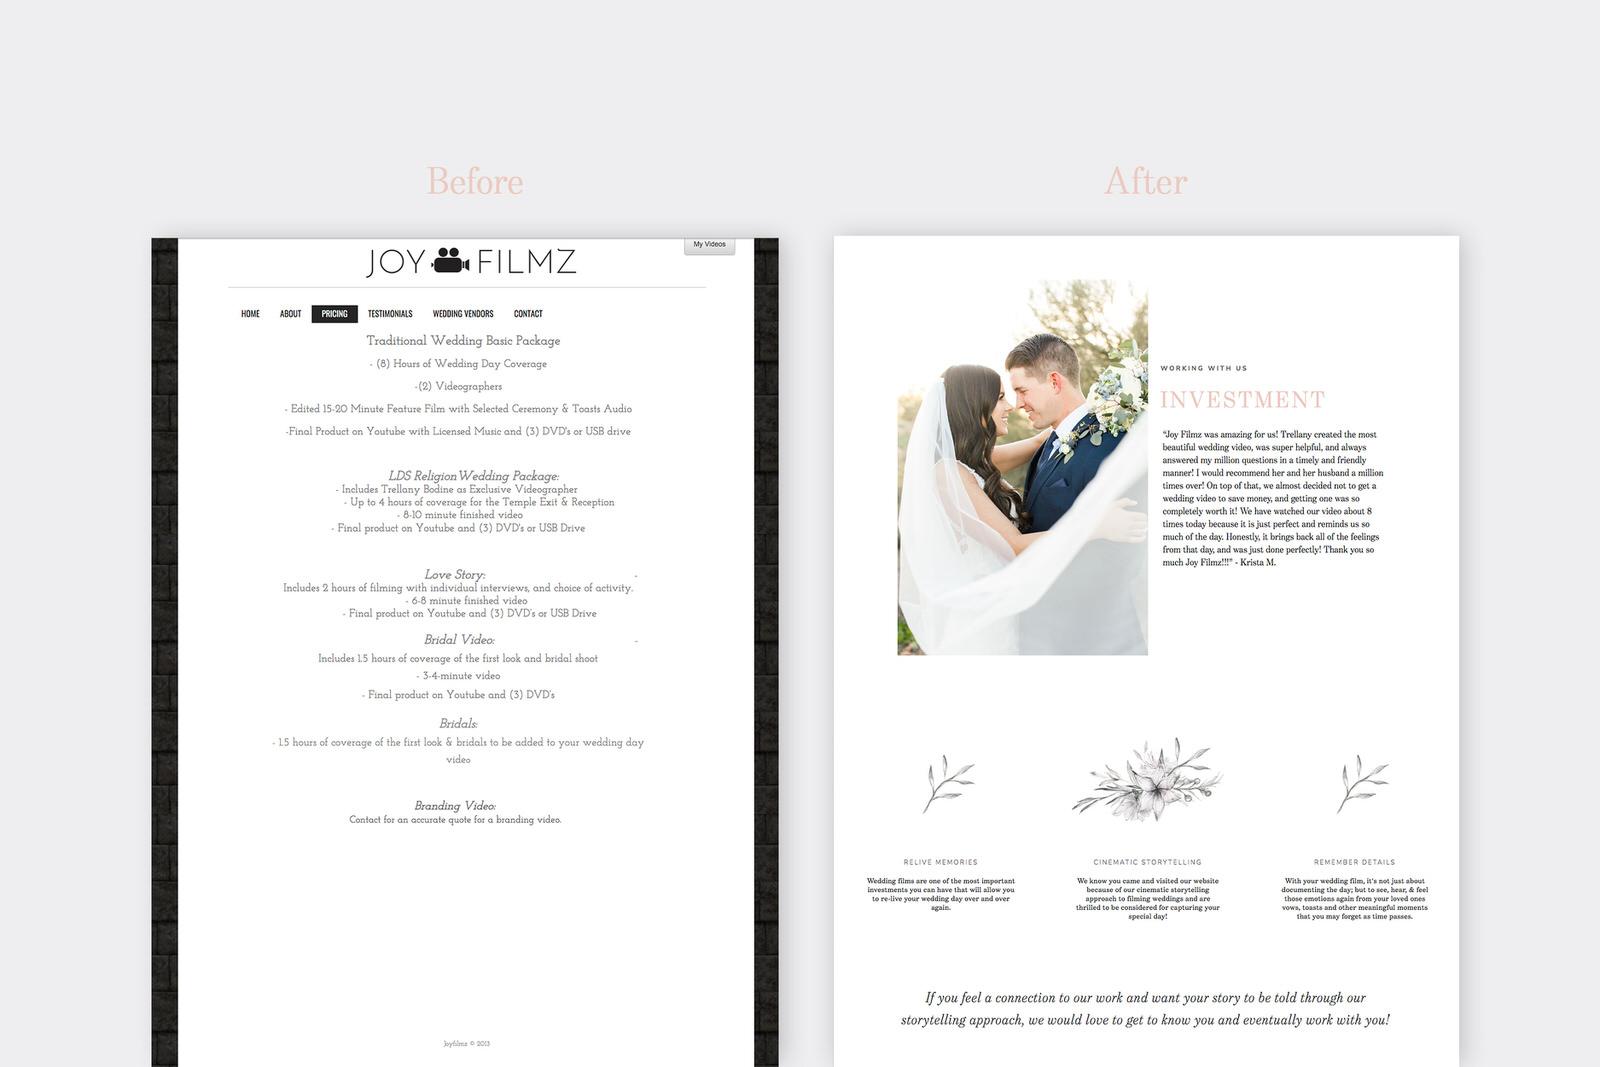 joyfilmz-portfolio2g.jpg